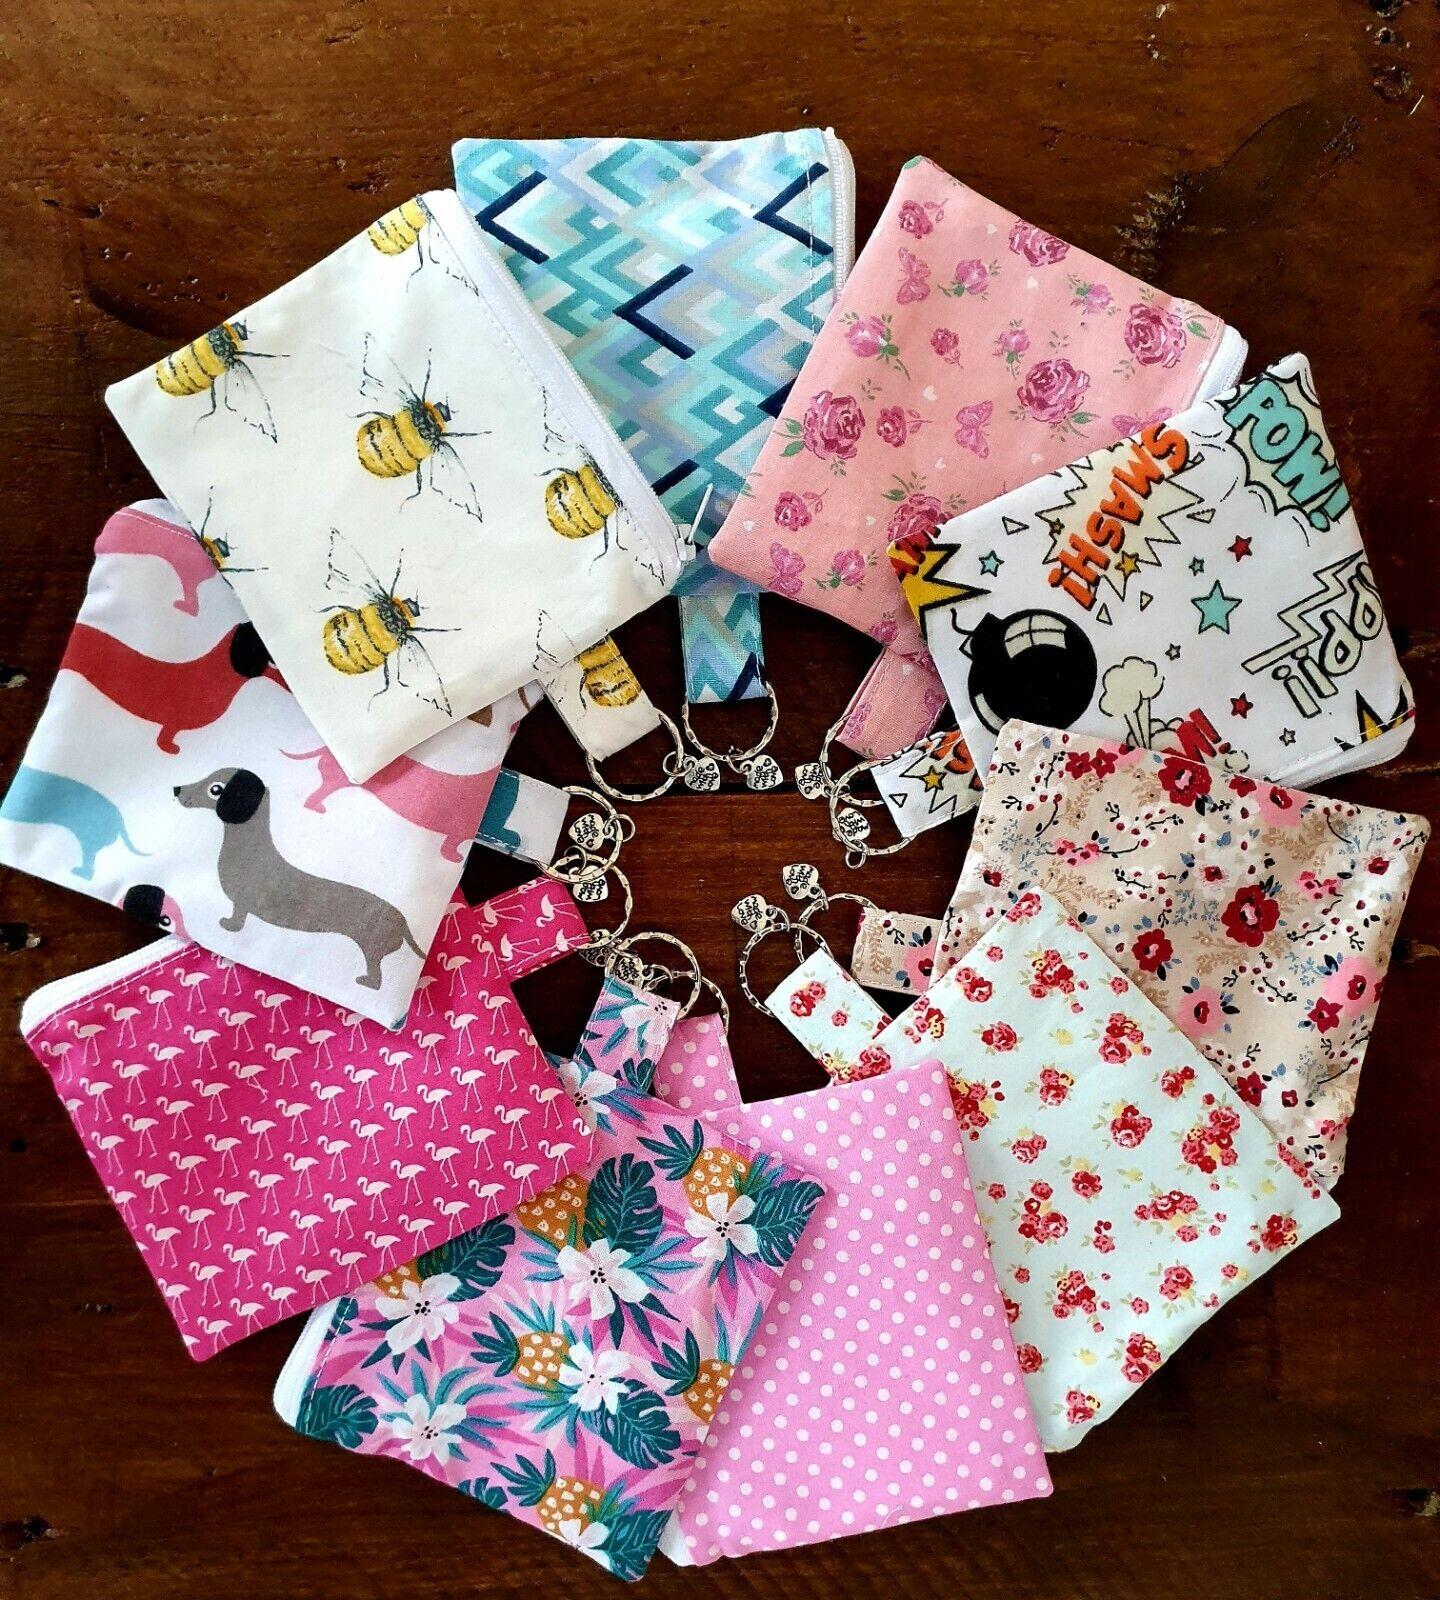 Handmade coin/ card purse with key holder! Bees, flamingo, dachshund, comic!